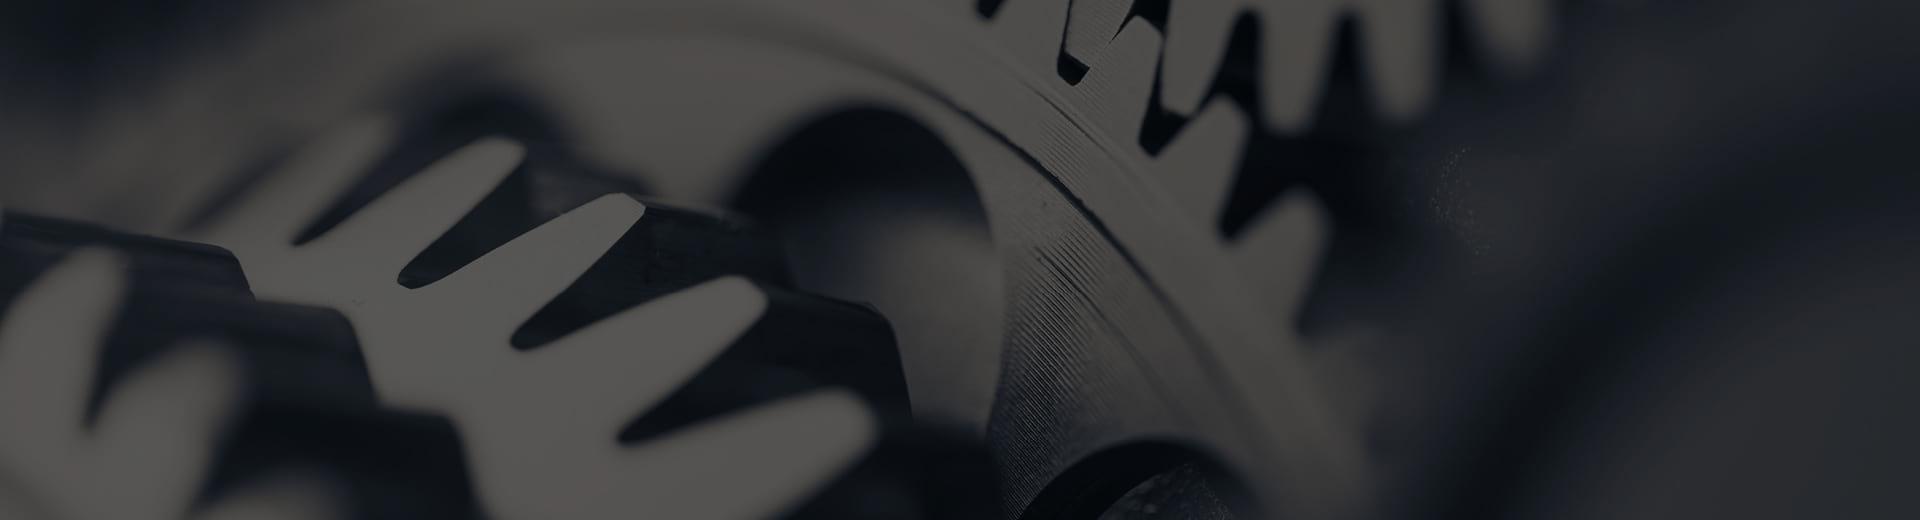 https://www.enolgas.it/sites/default/files/revslider/image/enolgas-immagini-slider-05b.jpg